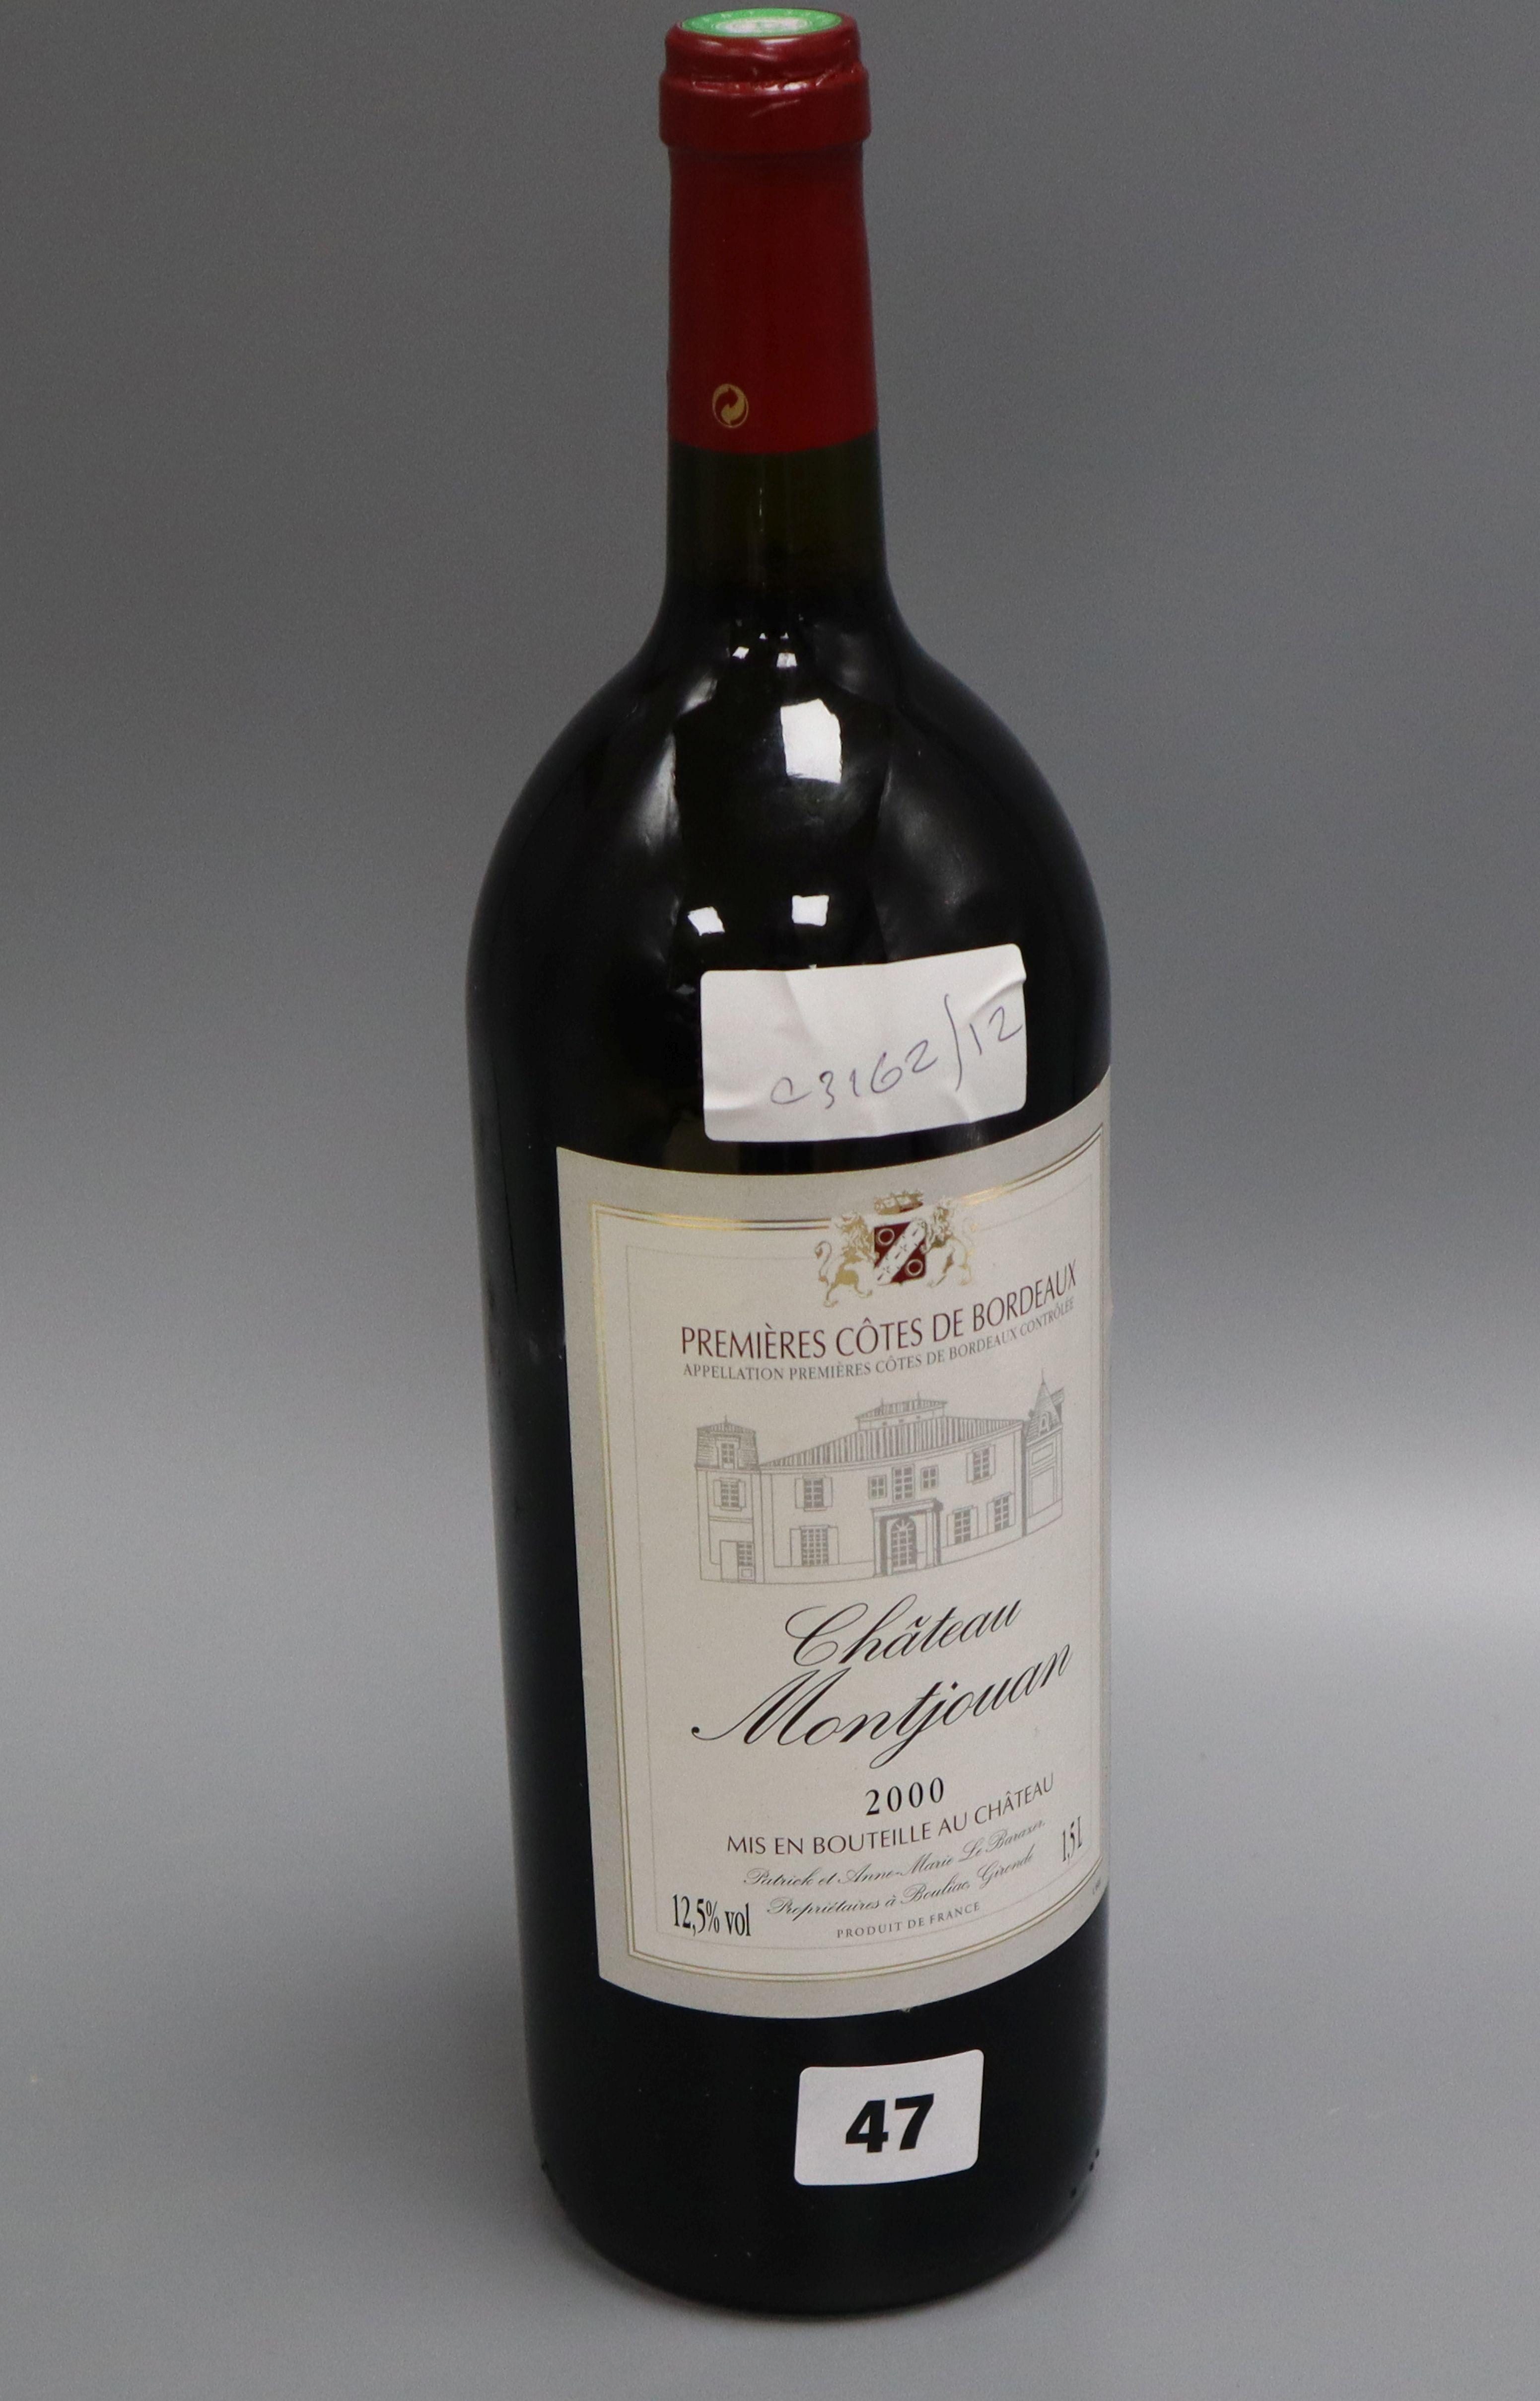 Lot 58 - A 1.5l bottle of Chateau Moutjonan 2000